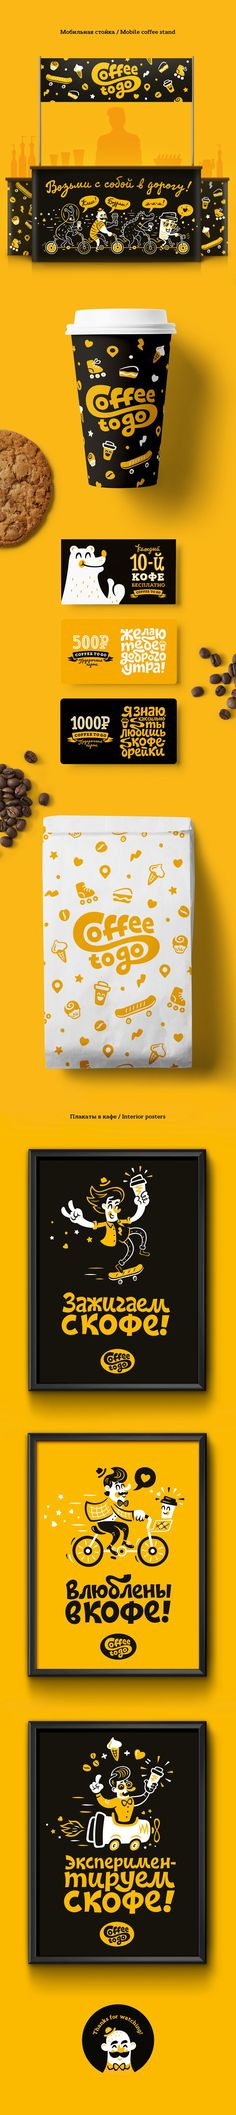 53 Ideas For Design Packaging Food Logo Identity Branding Design Visual, Graphisches Design, Logo Design, Brand Identity Design, Graphic Design Branding, Typography Design, Creative Design, Brand Design, Design Ideas